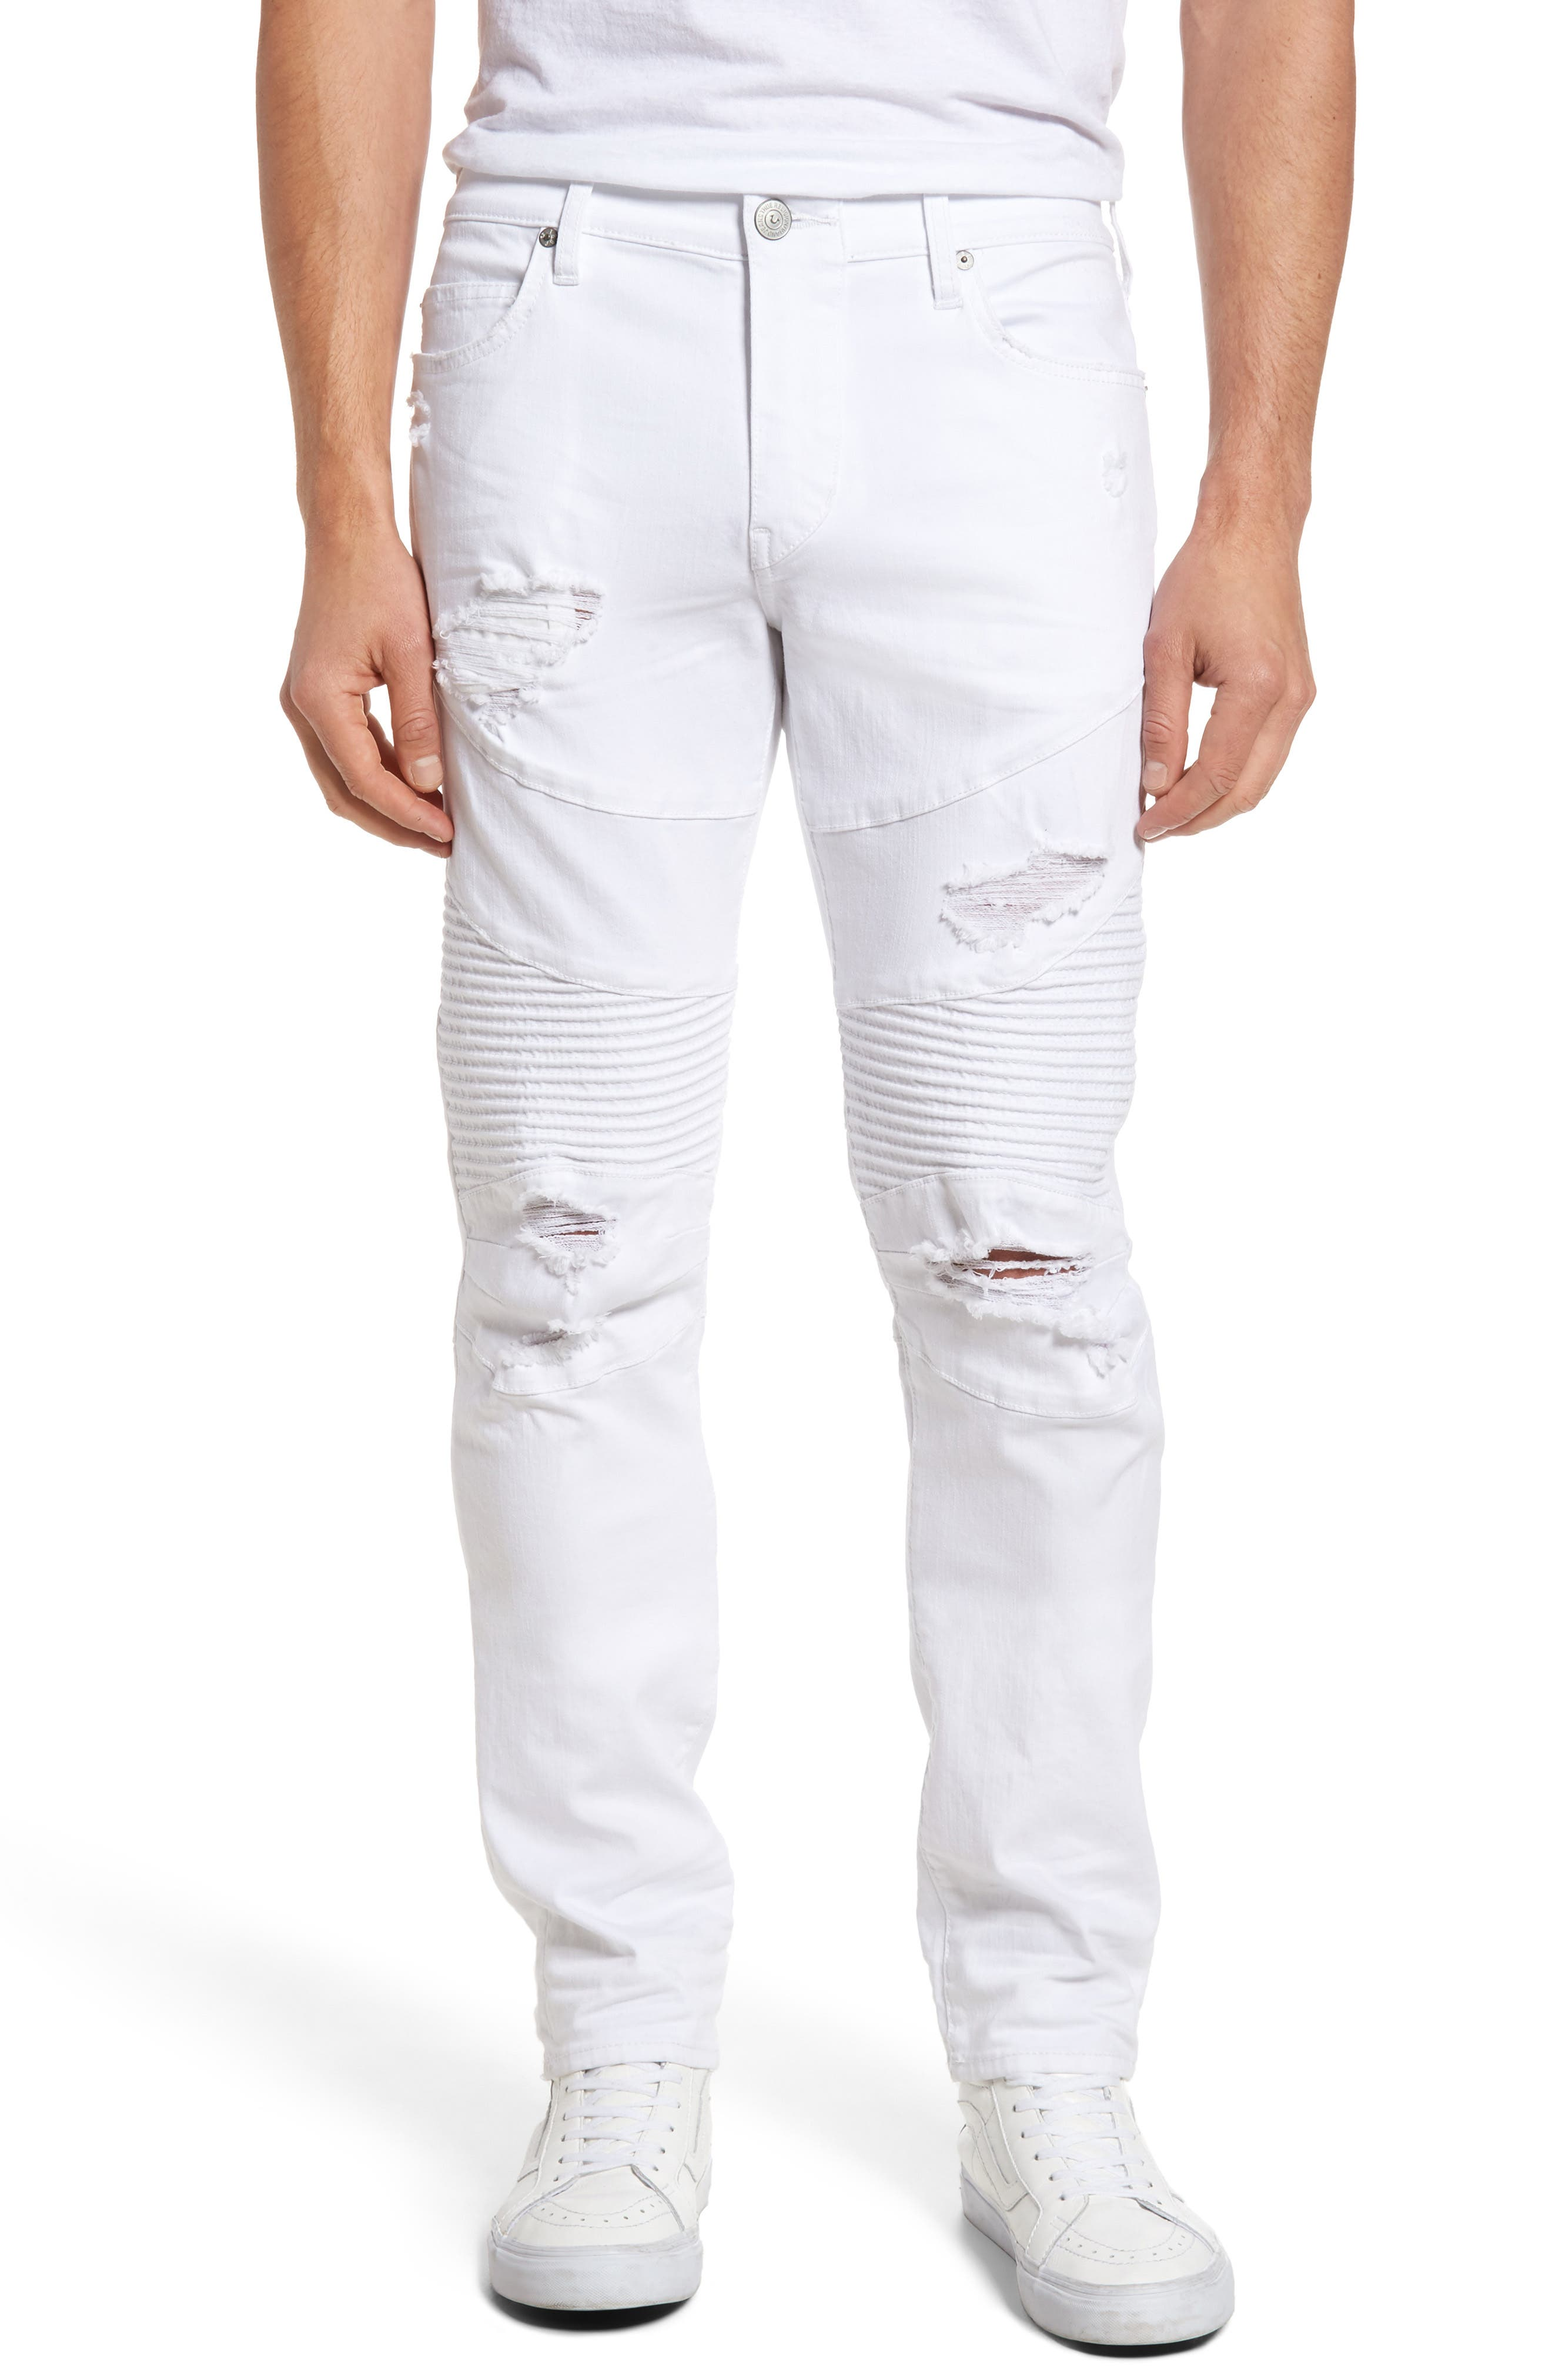 TRUE RELIGION BRAND JEANS Rocco Skinny Fit Moto Jeans